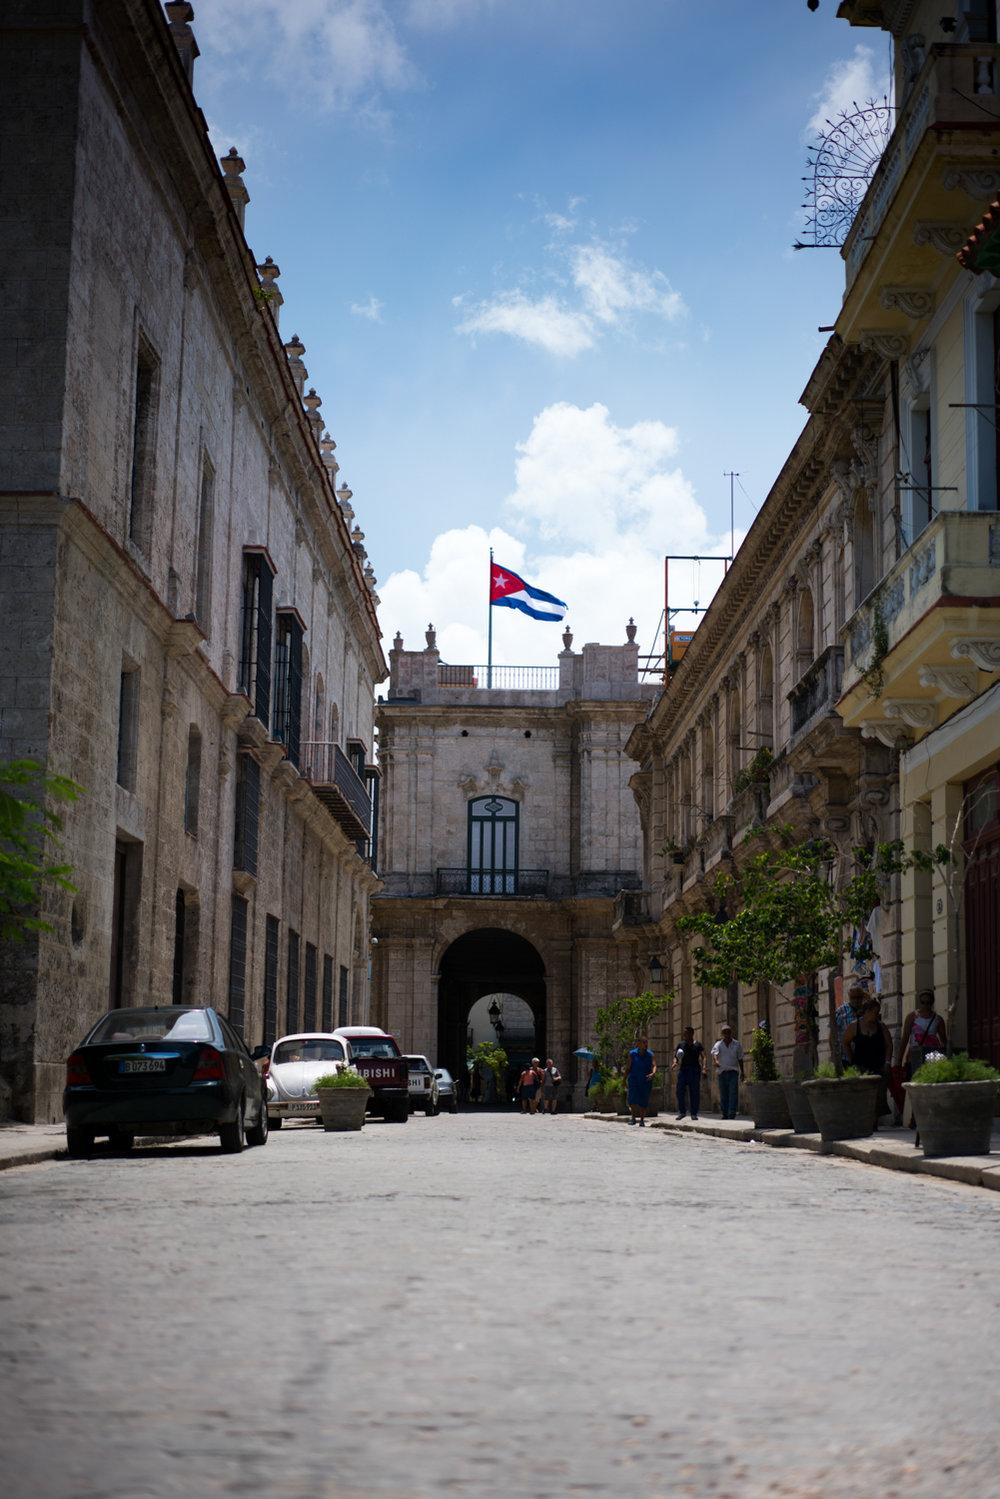 Classic Habana Vieja  Sony A7RII, Sony Zeiss 55mm f.1.8 (iso50, f/1.8, 1/3200s)